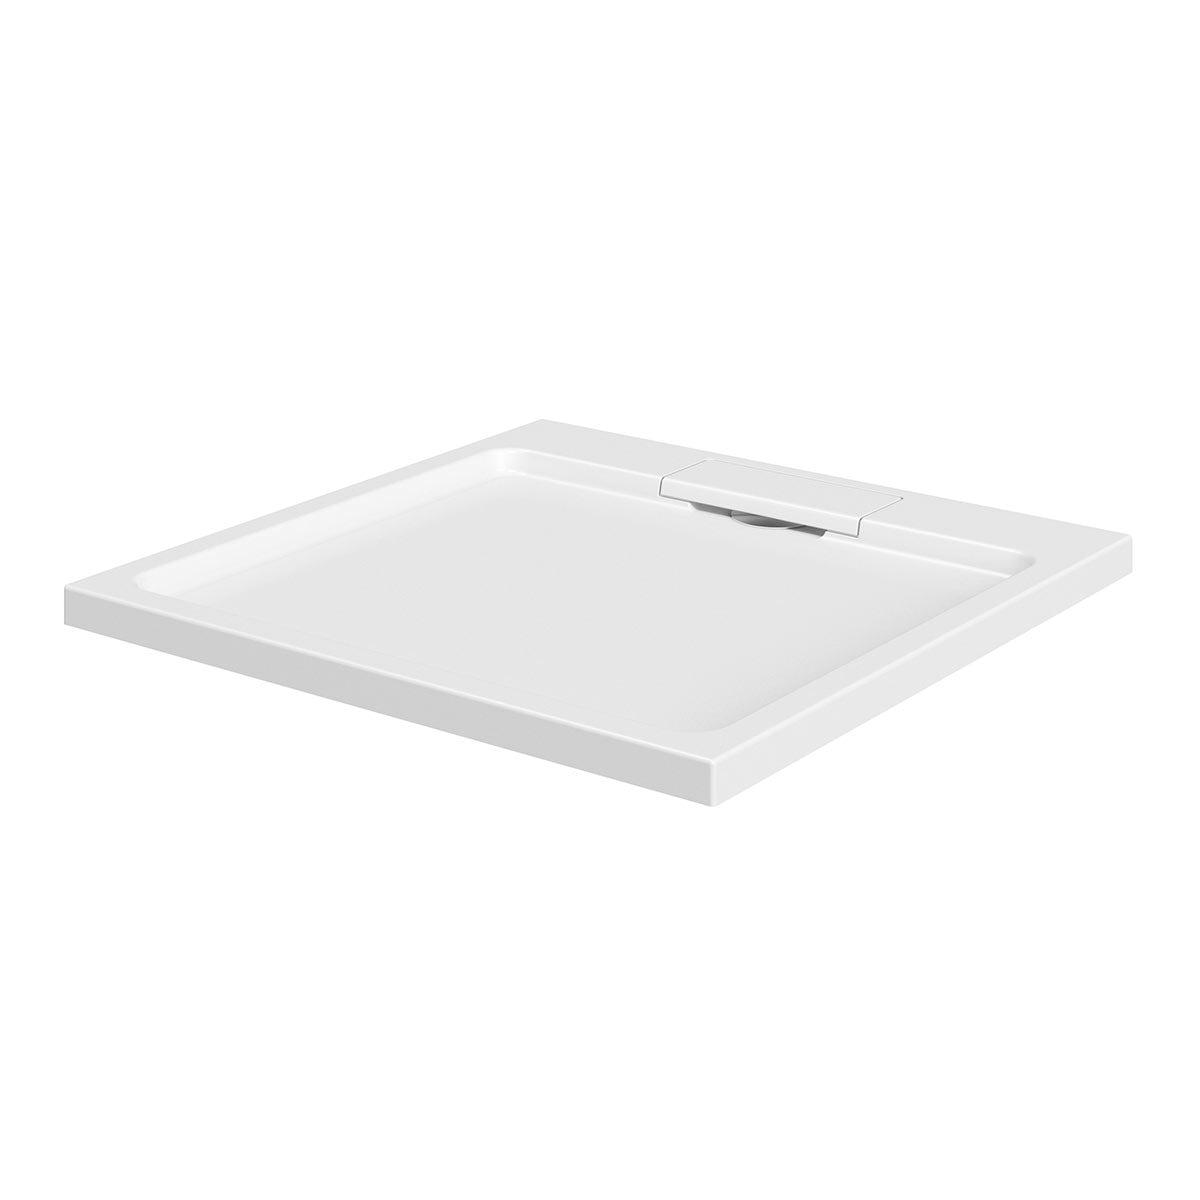 Mode Designer square stone shower tray